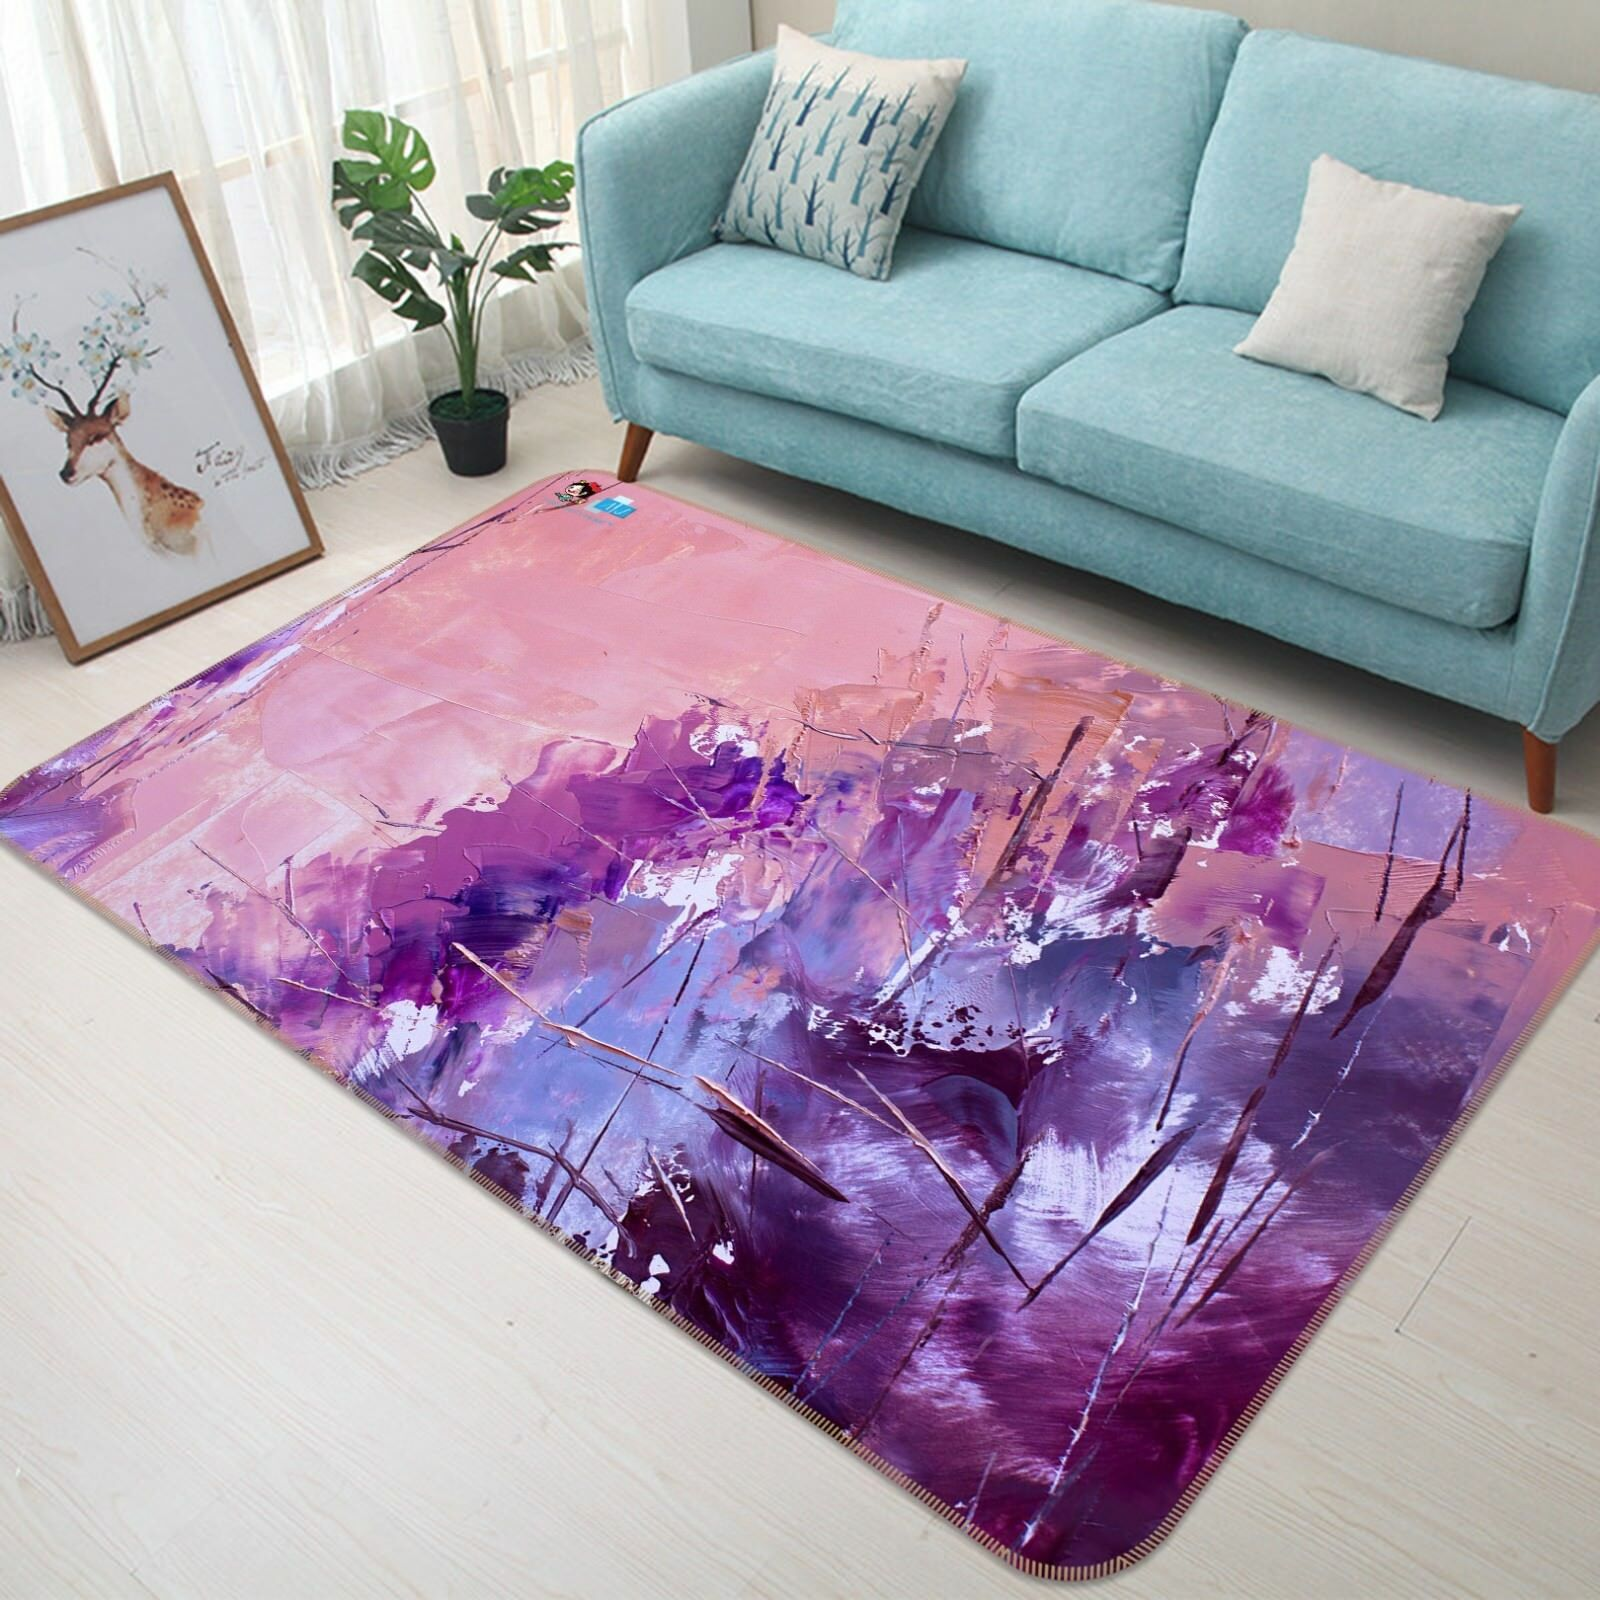 3d púrpura pintar 52 antideslizante alfombra de maletero calidad elegante alfombra de